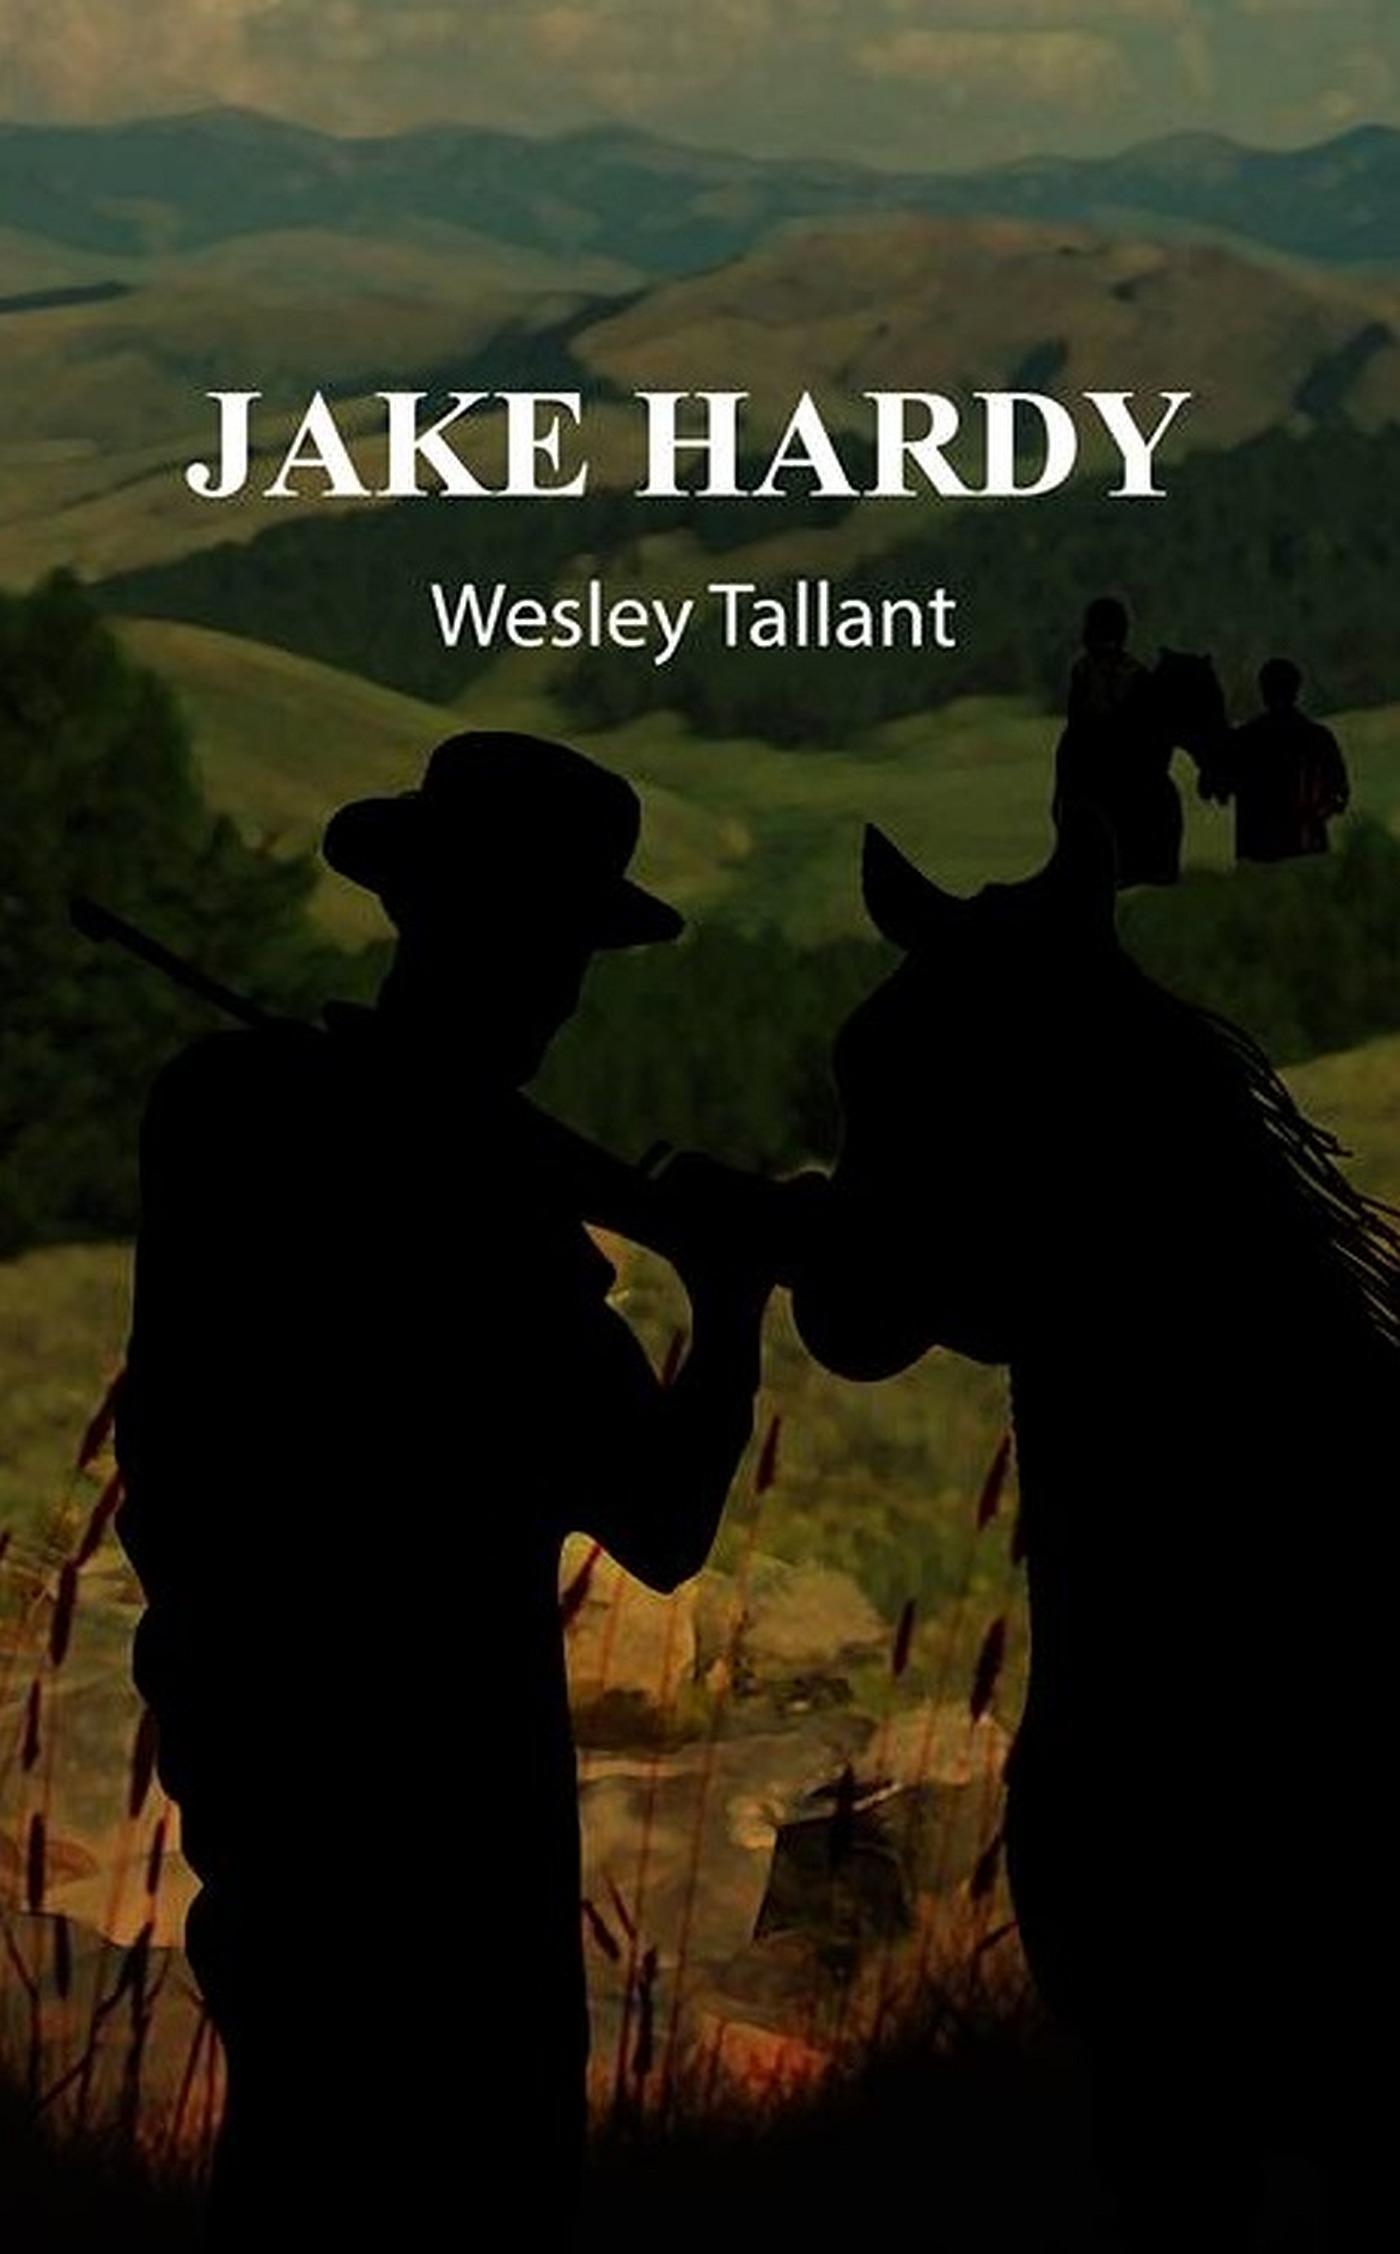 Jake Hardy Wesley Tallant